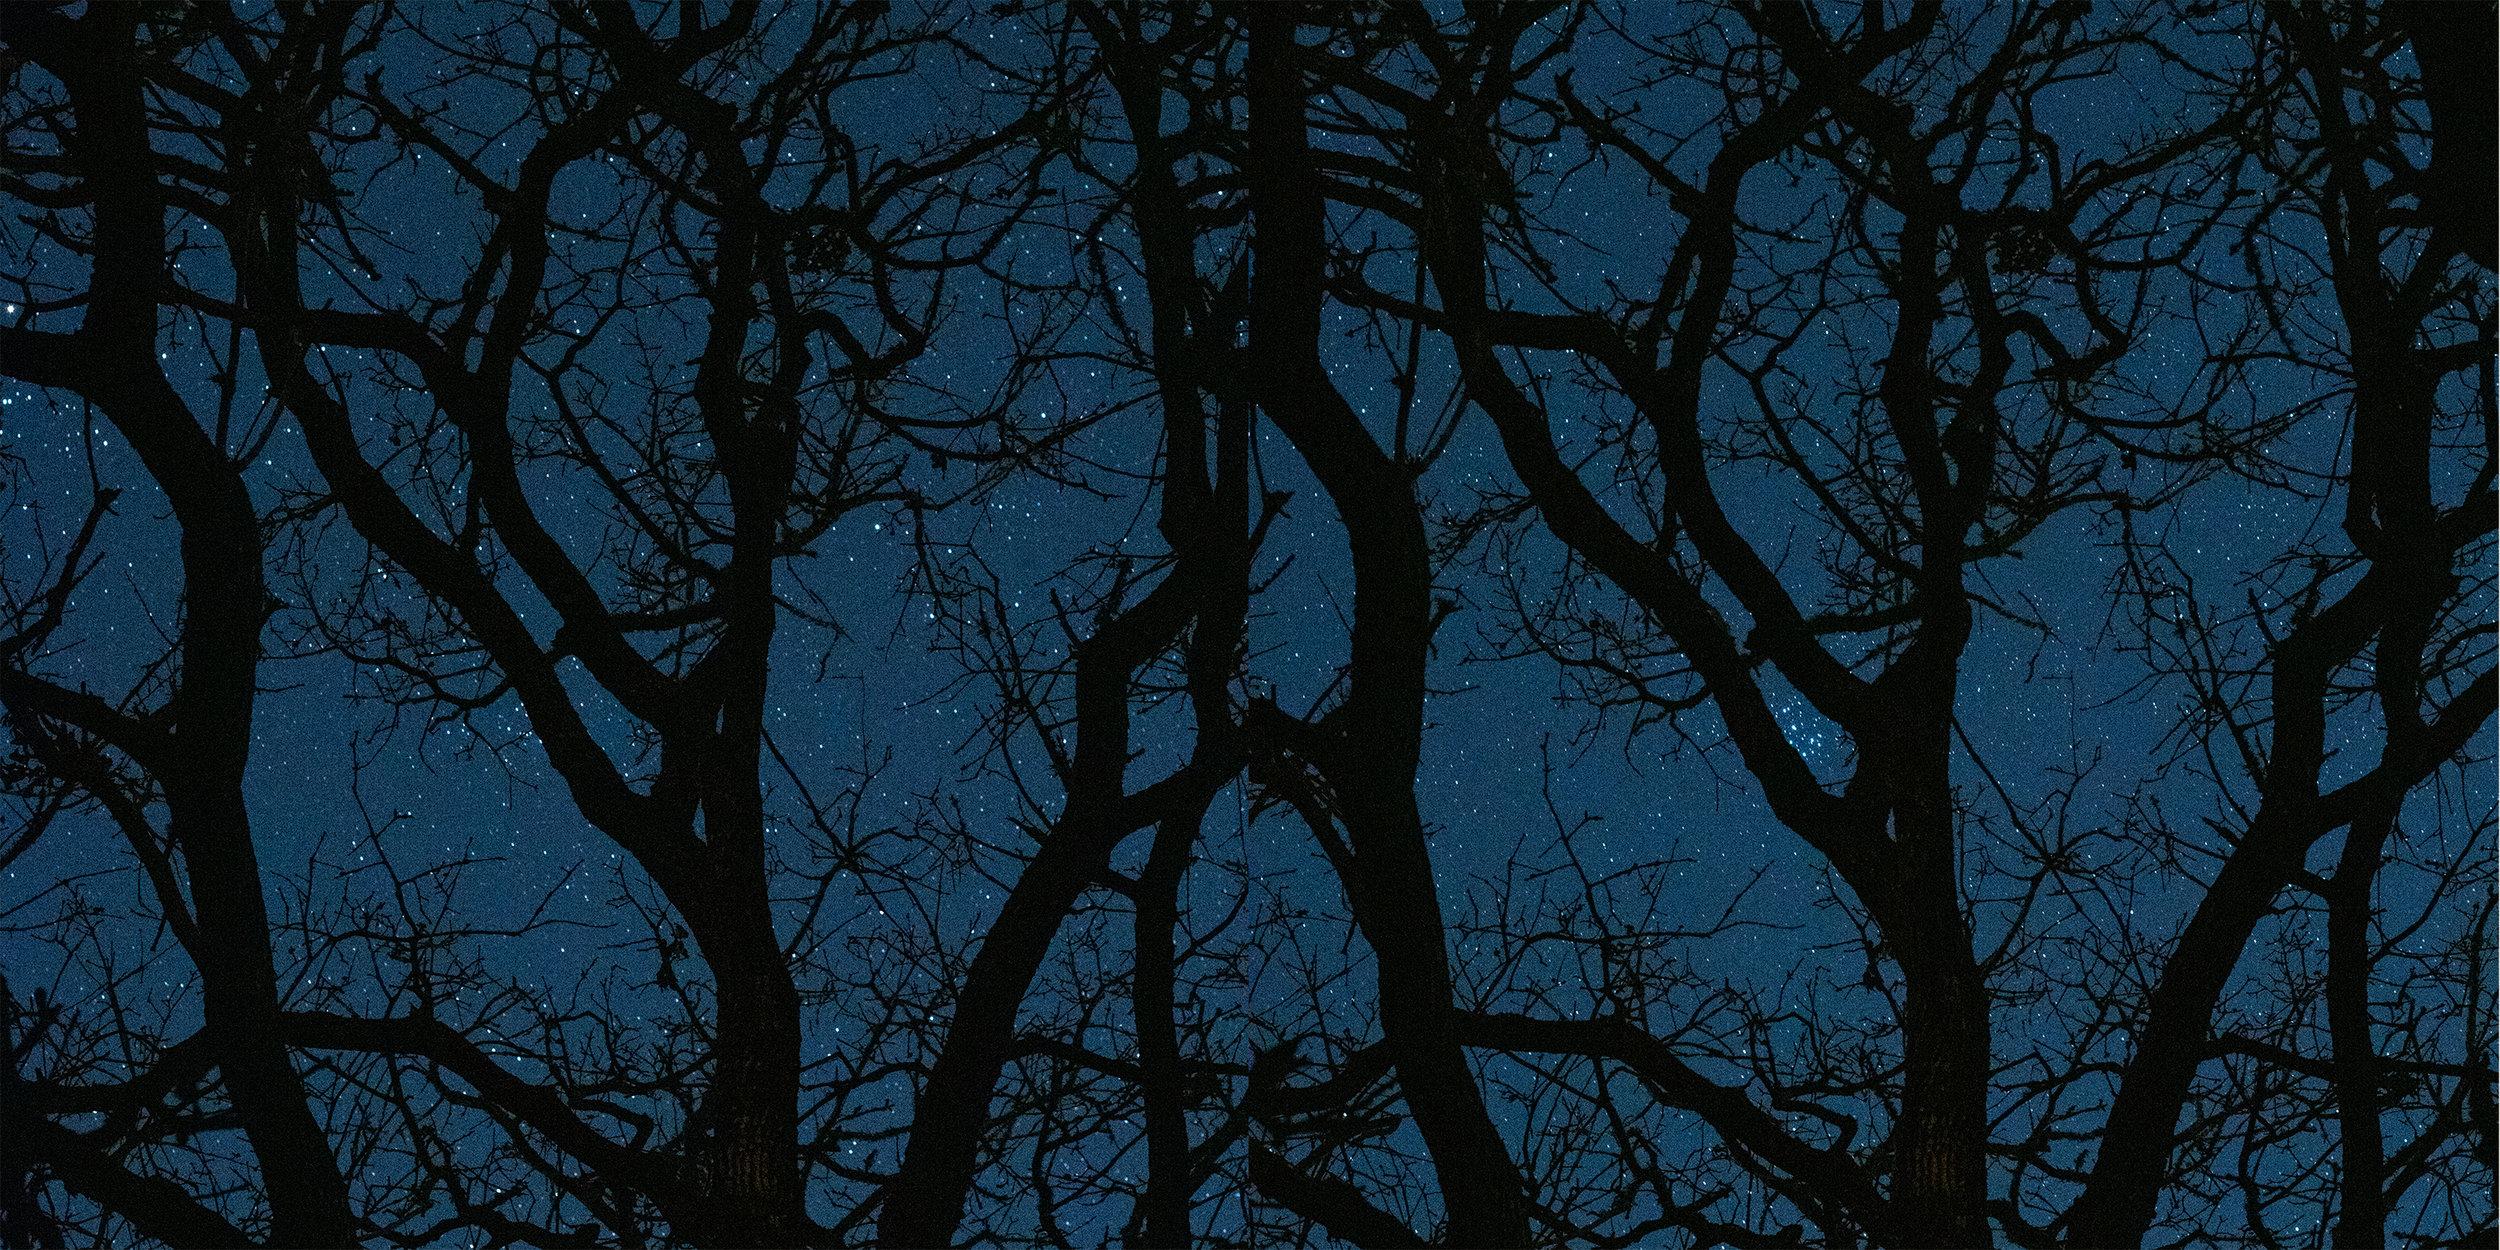 tree and stars.jpg